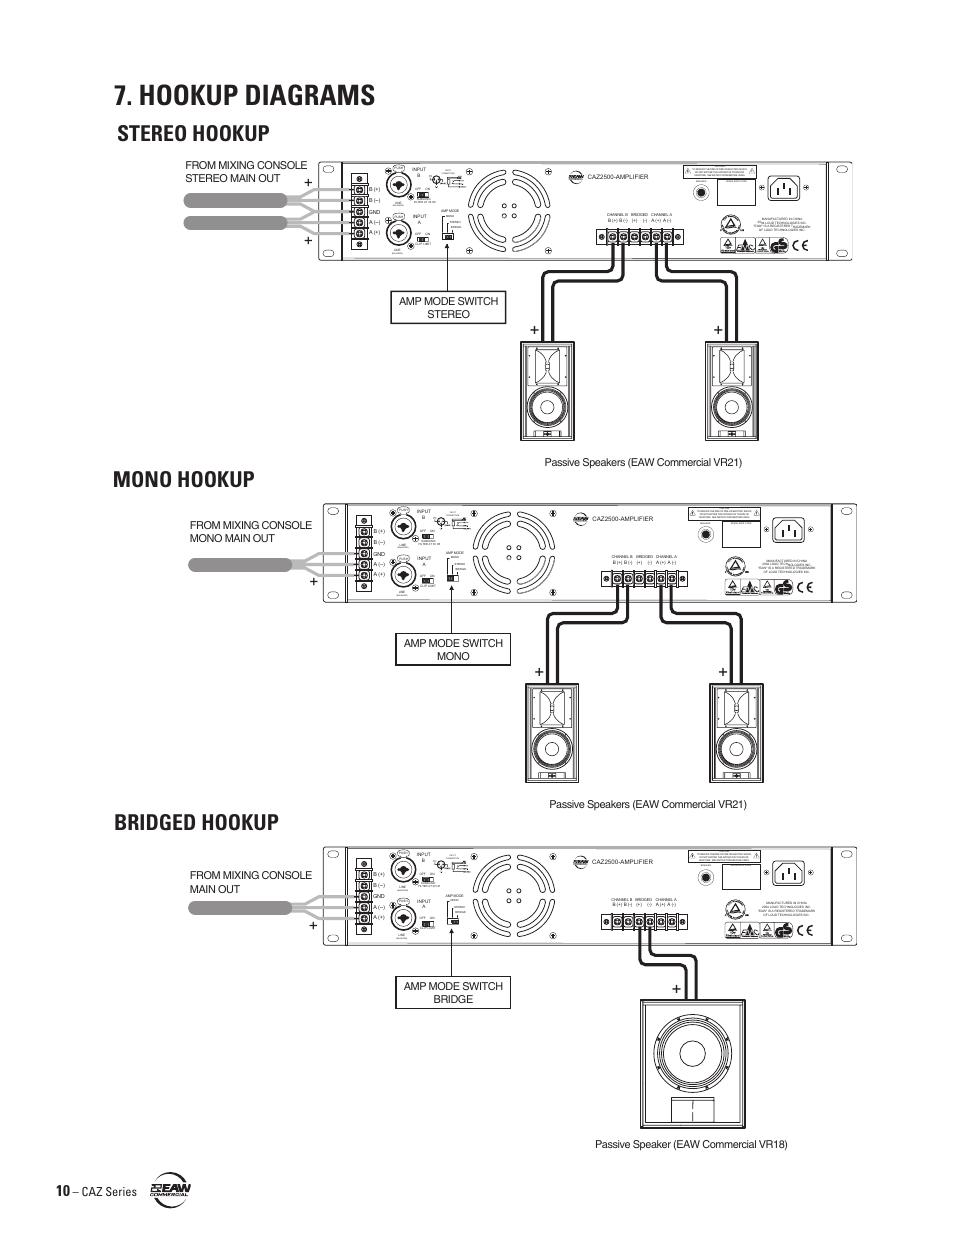 medium resolution of hookup diagrams stereo hookup mono hookup bridged hookup balanced eaw caz2500 user manual page 10 16